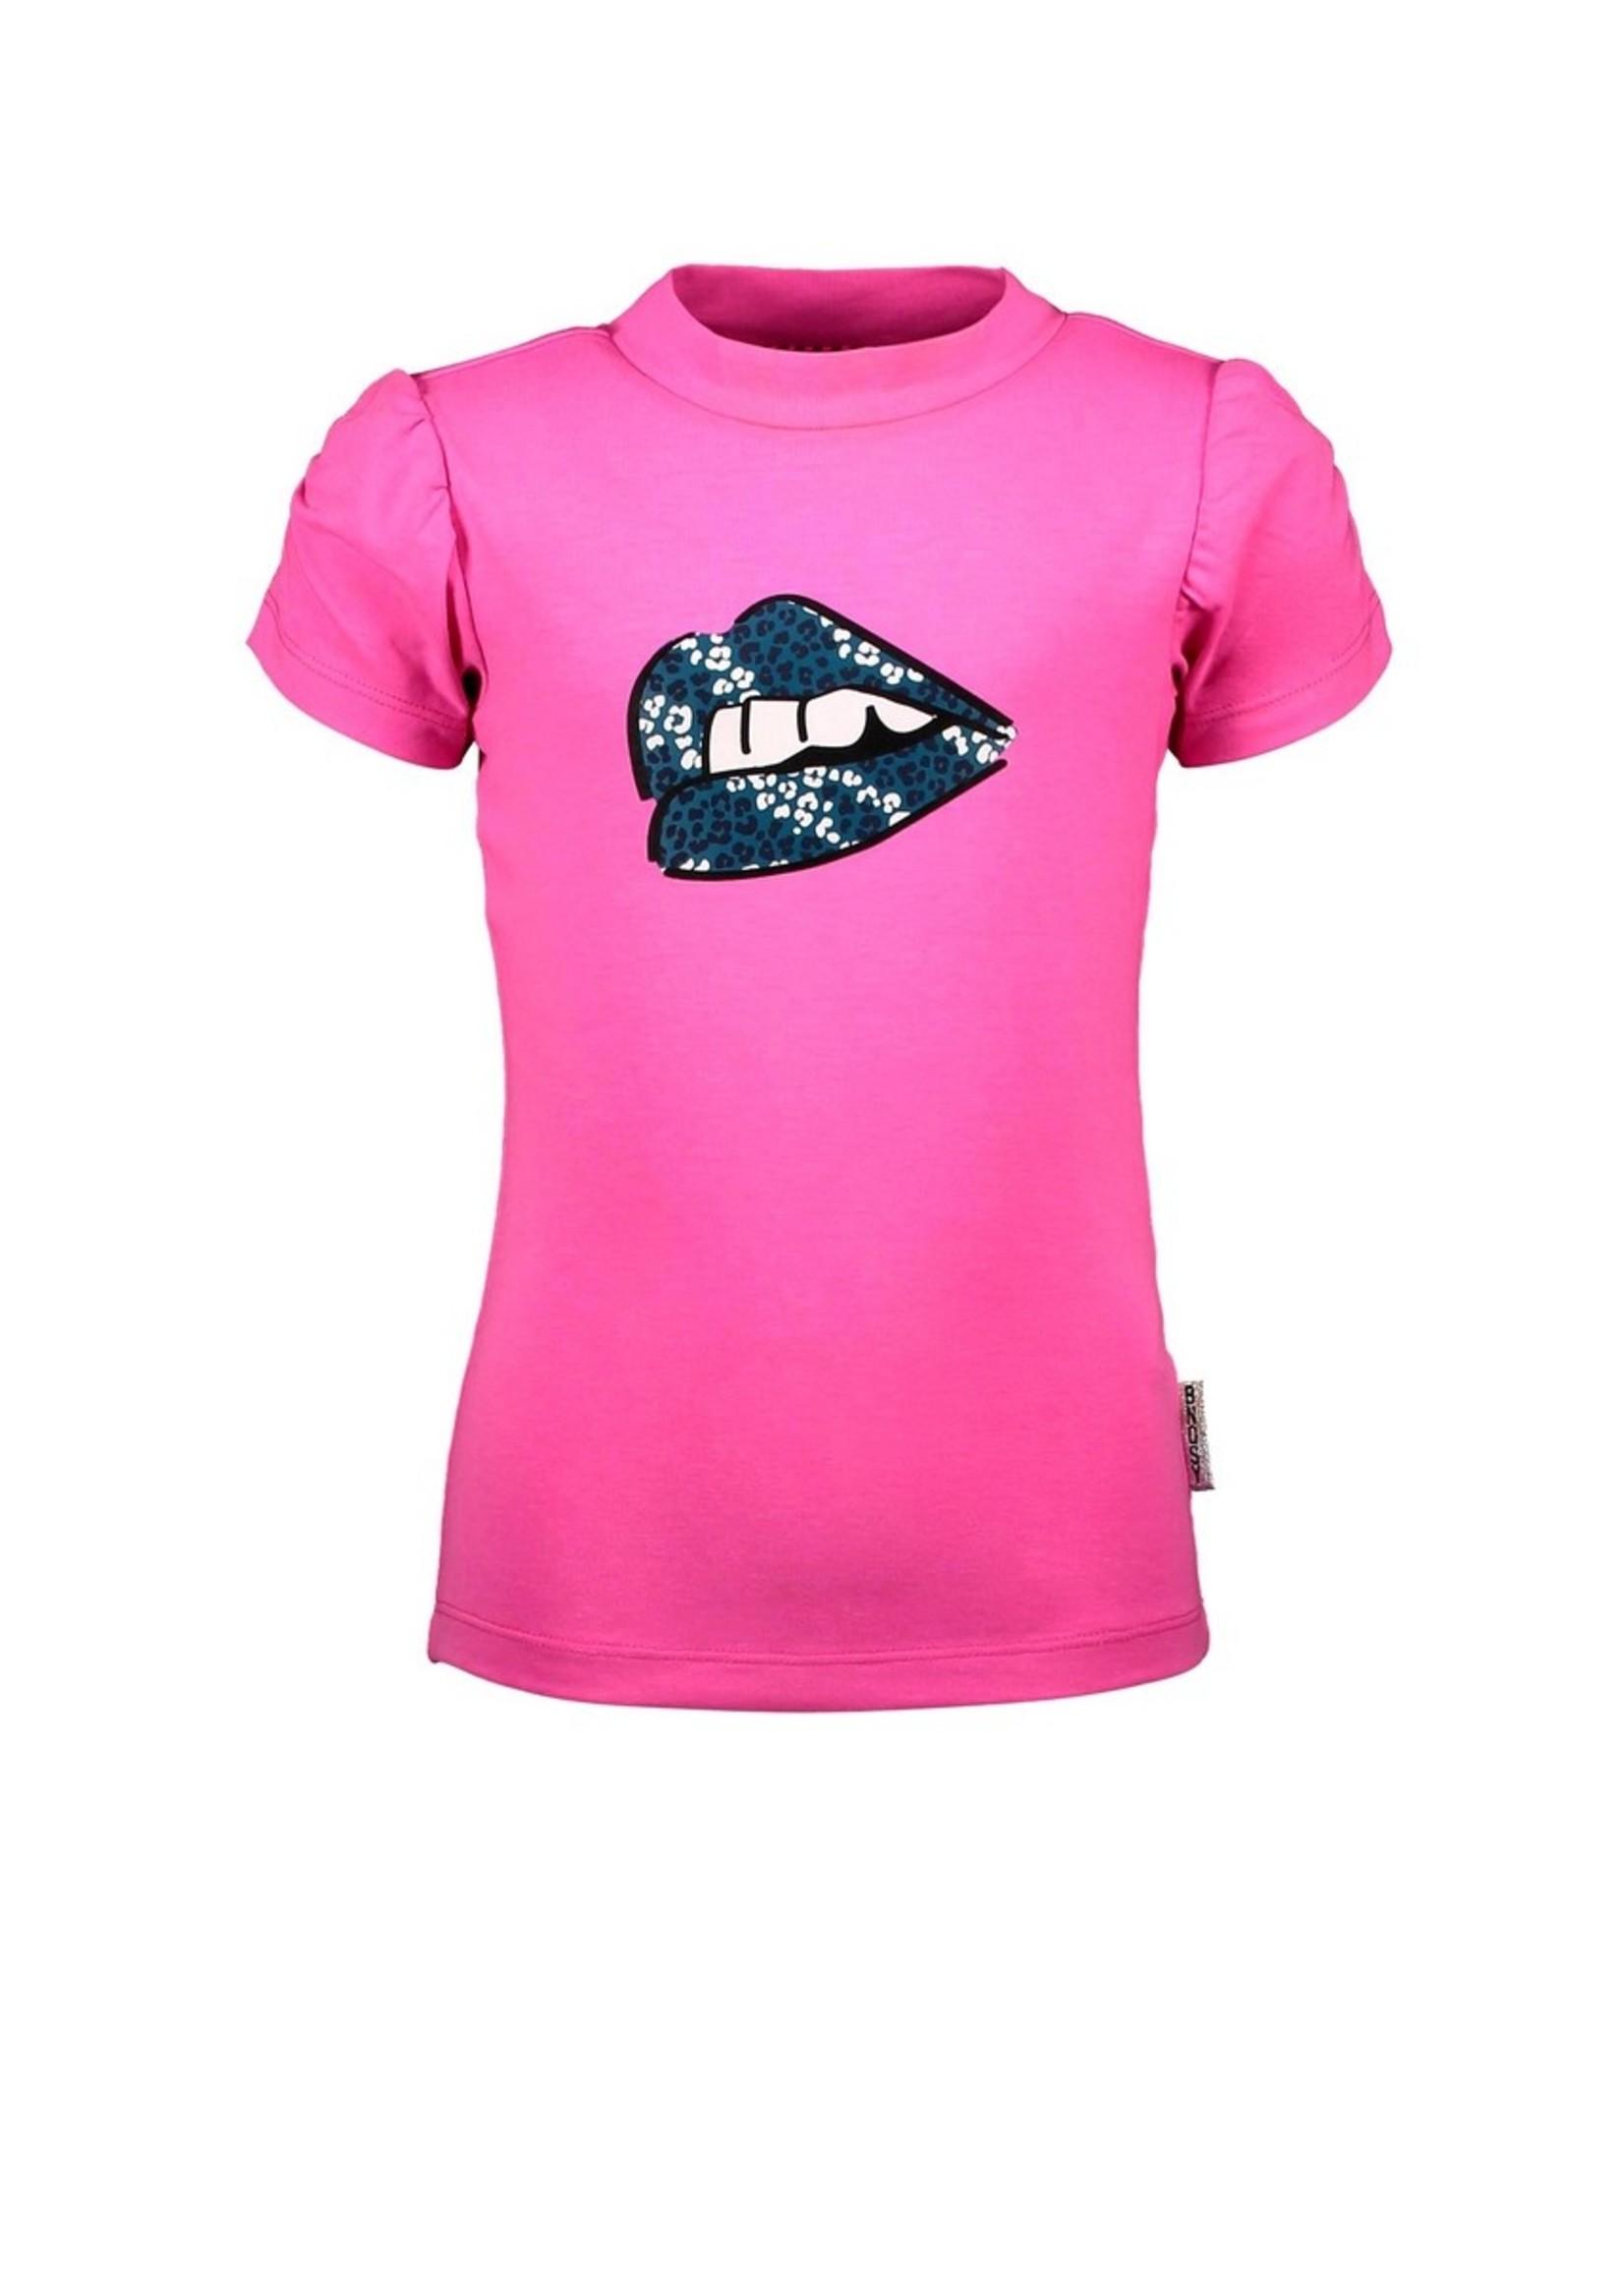 B.nosy Shirt Sugar Plum